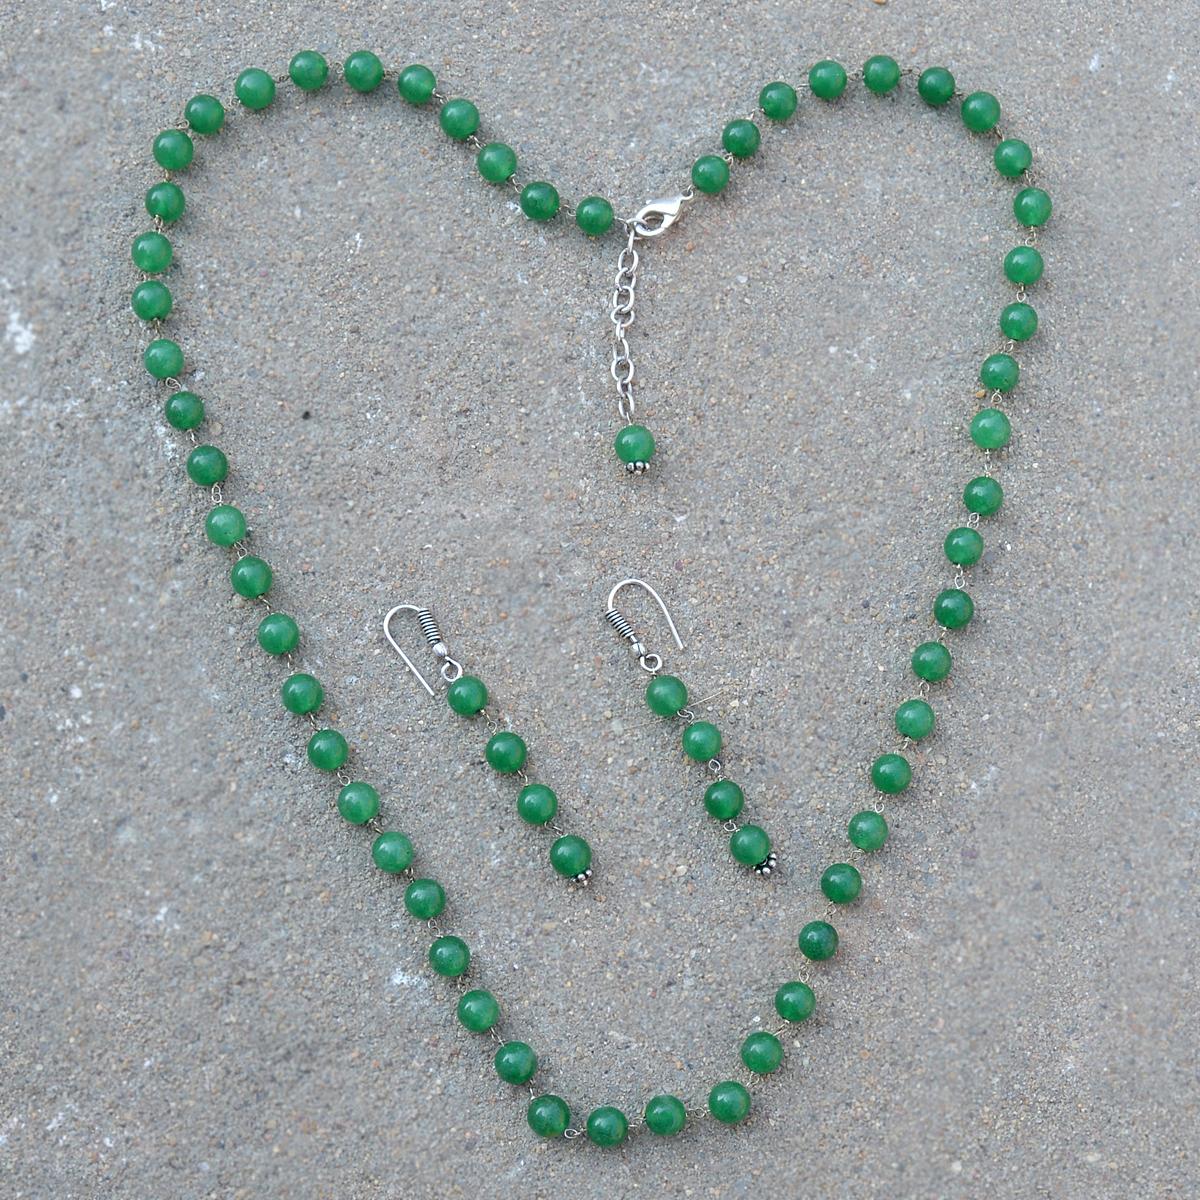 Green Quartz Silver Necklace Set PG-156686